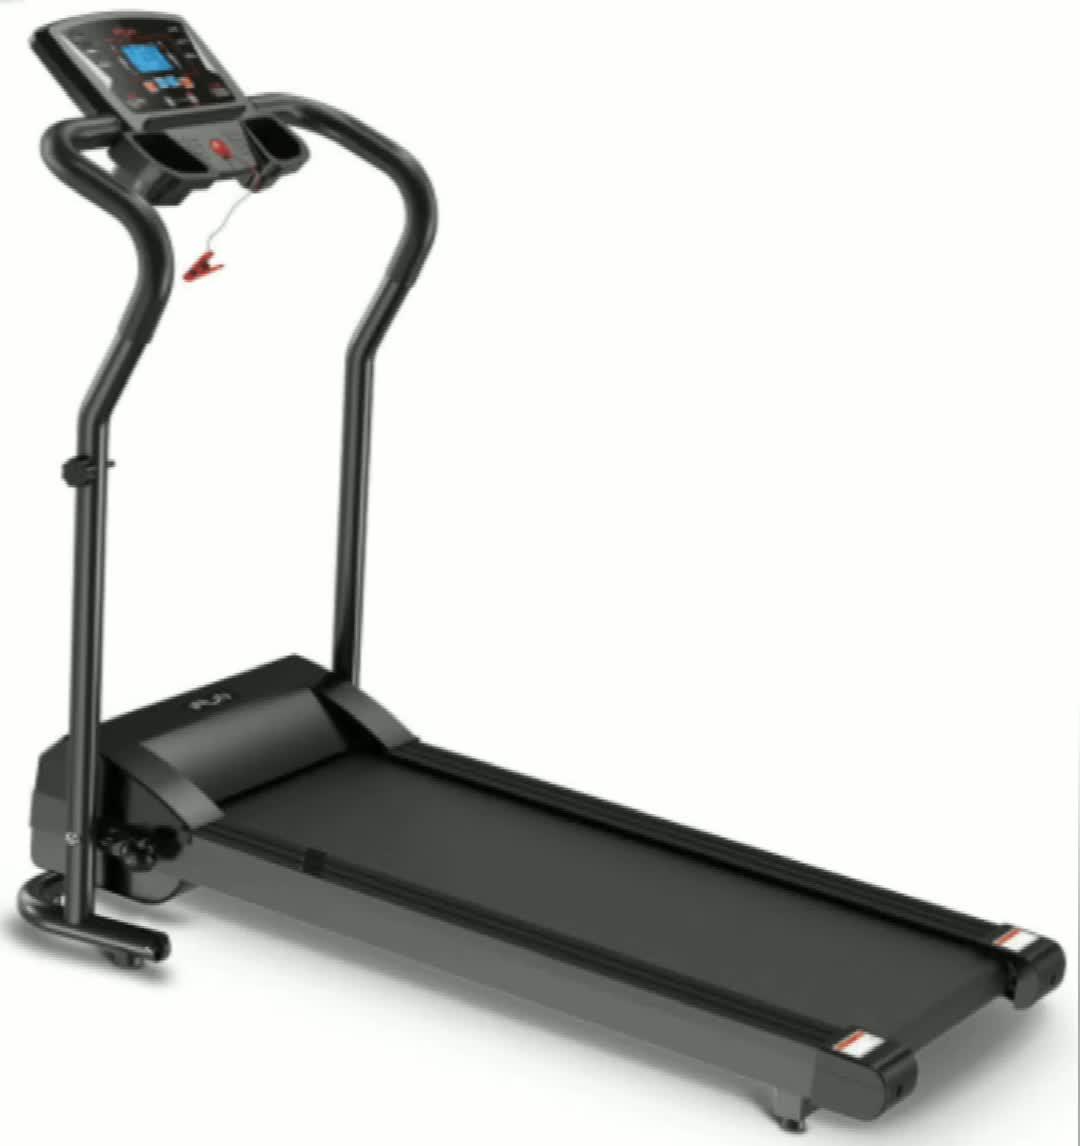 New desgin S100 Motorized Gym Treadmill/l home exercise running machine motorized treadmill